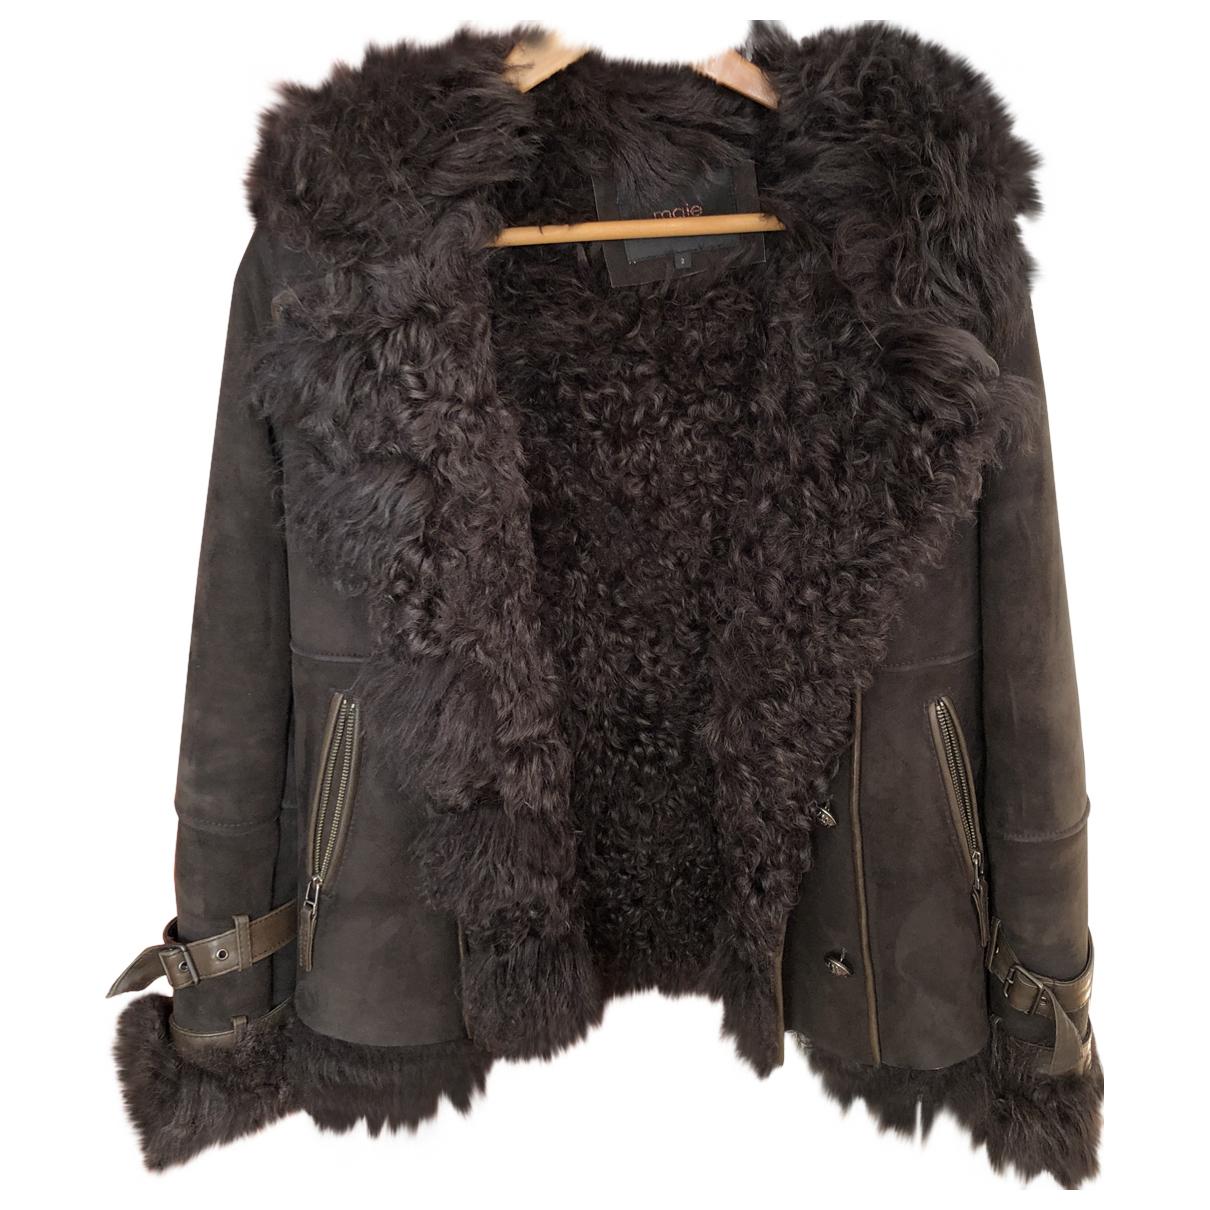 Maje Fall Winter 2019 Brown Mongolian Lamb Leather jacket for Women 38 FR